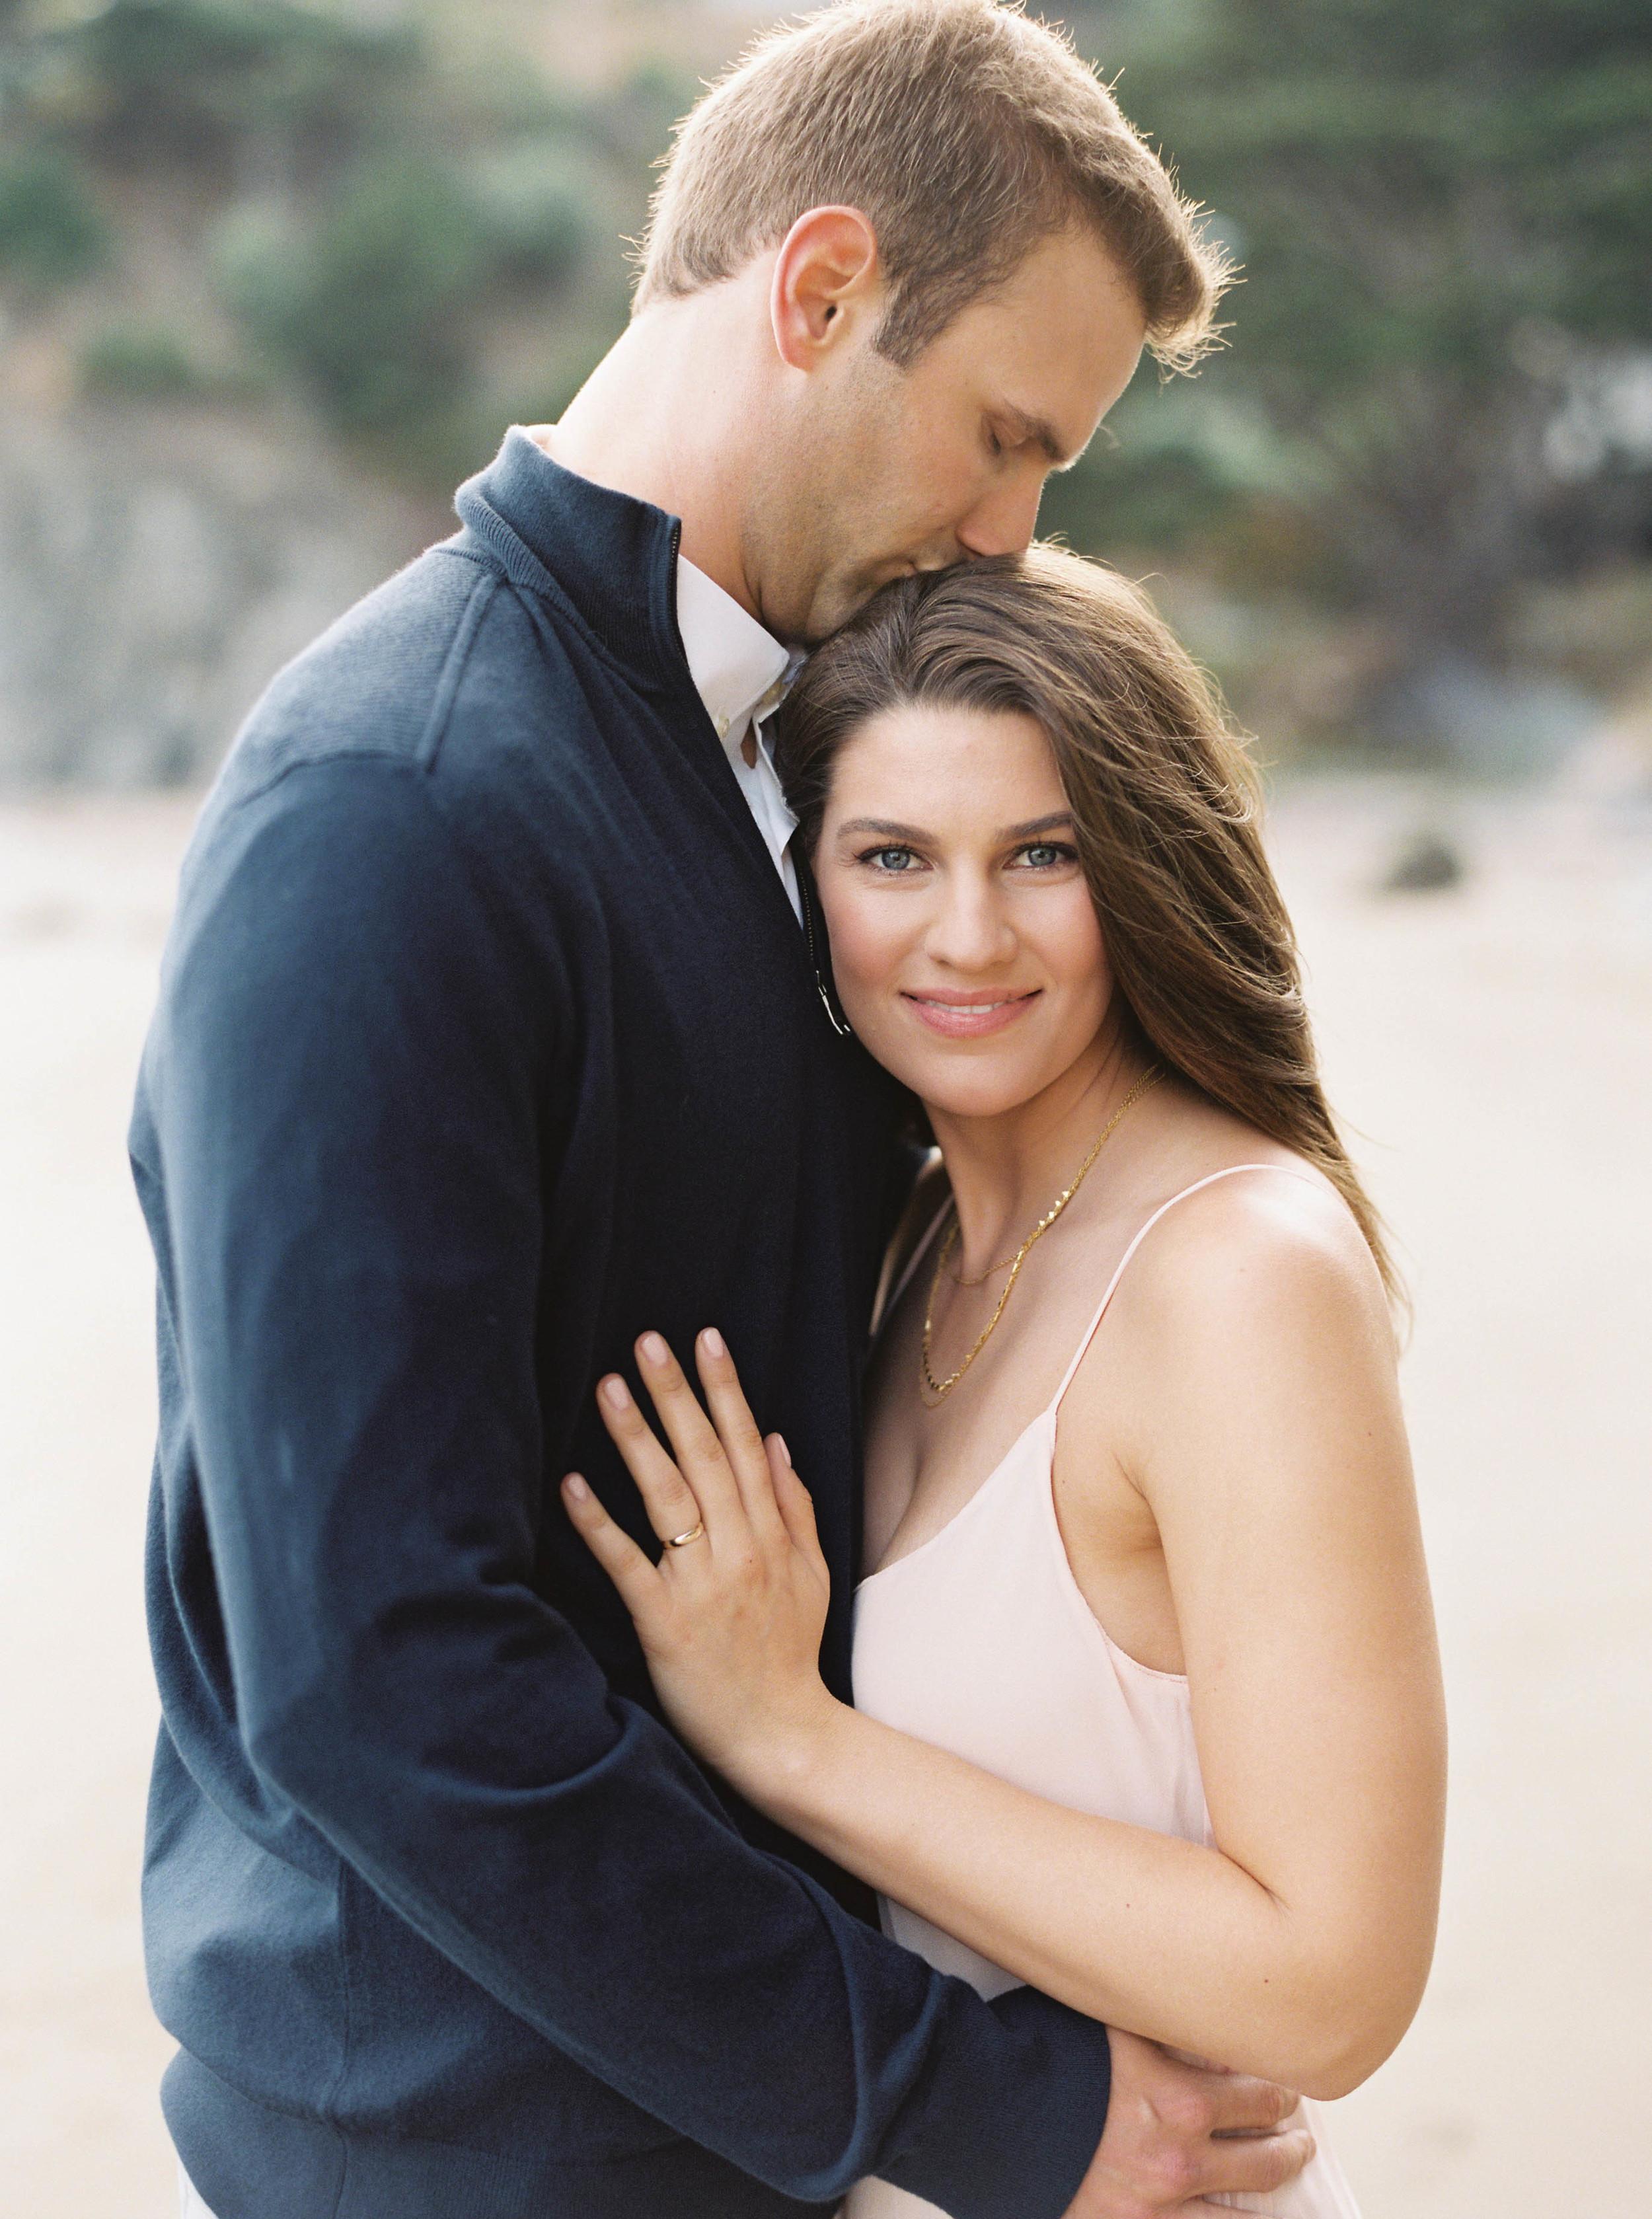 Meghan Mehan Photography - Fine Art Film Wedding Photography - San Francisco | Napa | Sonoma | Big Sur | Santa Barbara - 044.jpg